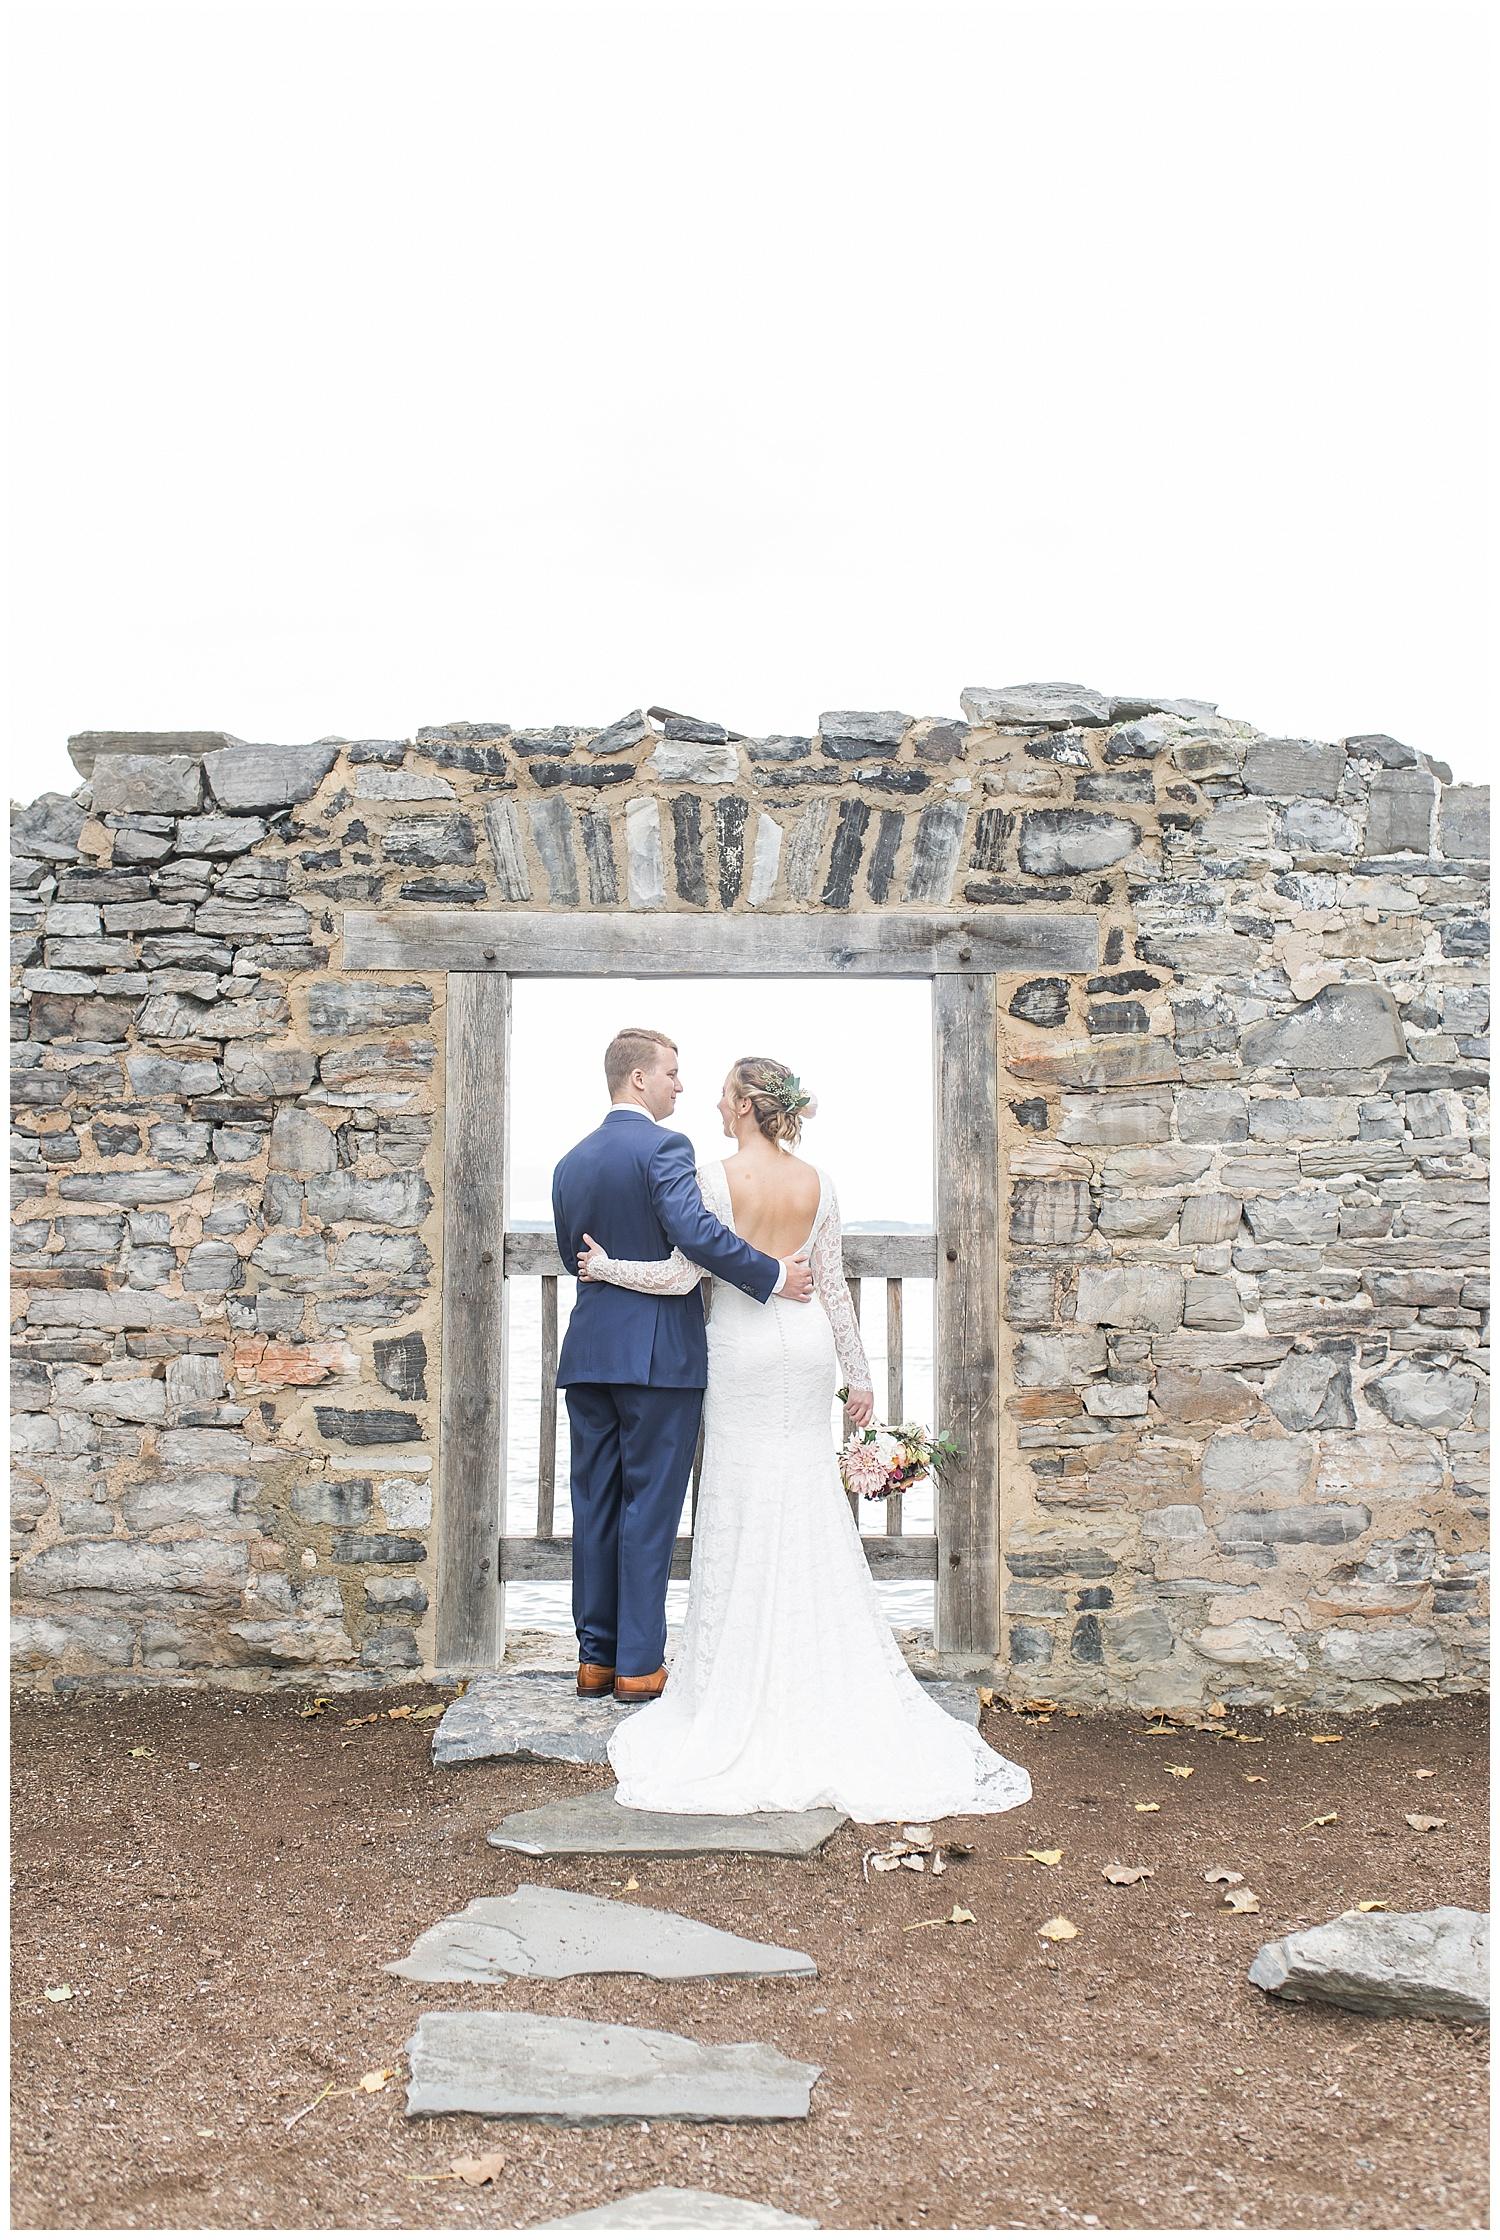 Margaret and Colin - Inns of Aurora - Lass and Beau-827_Buffalo wedding photography.jpg